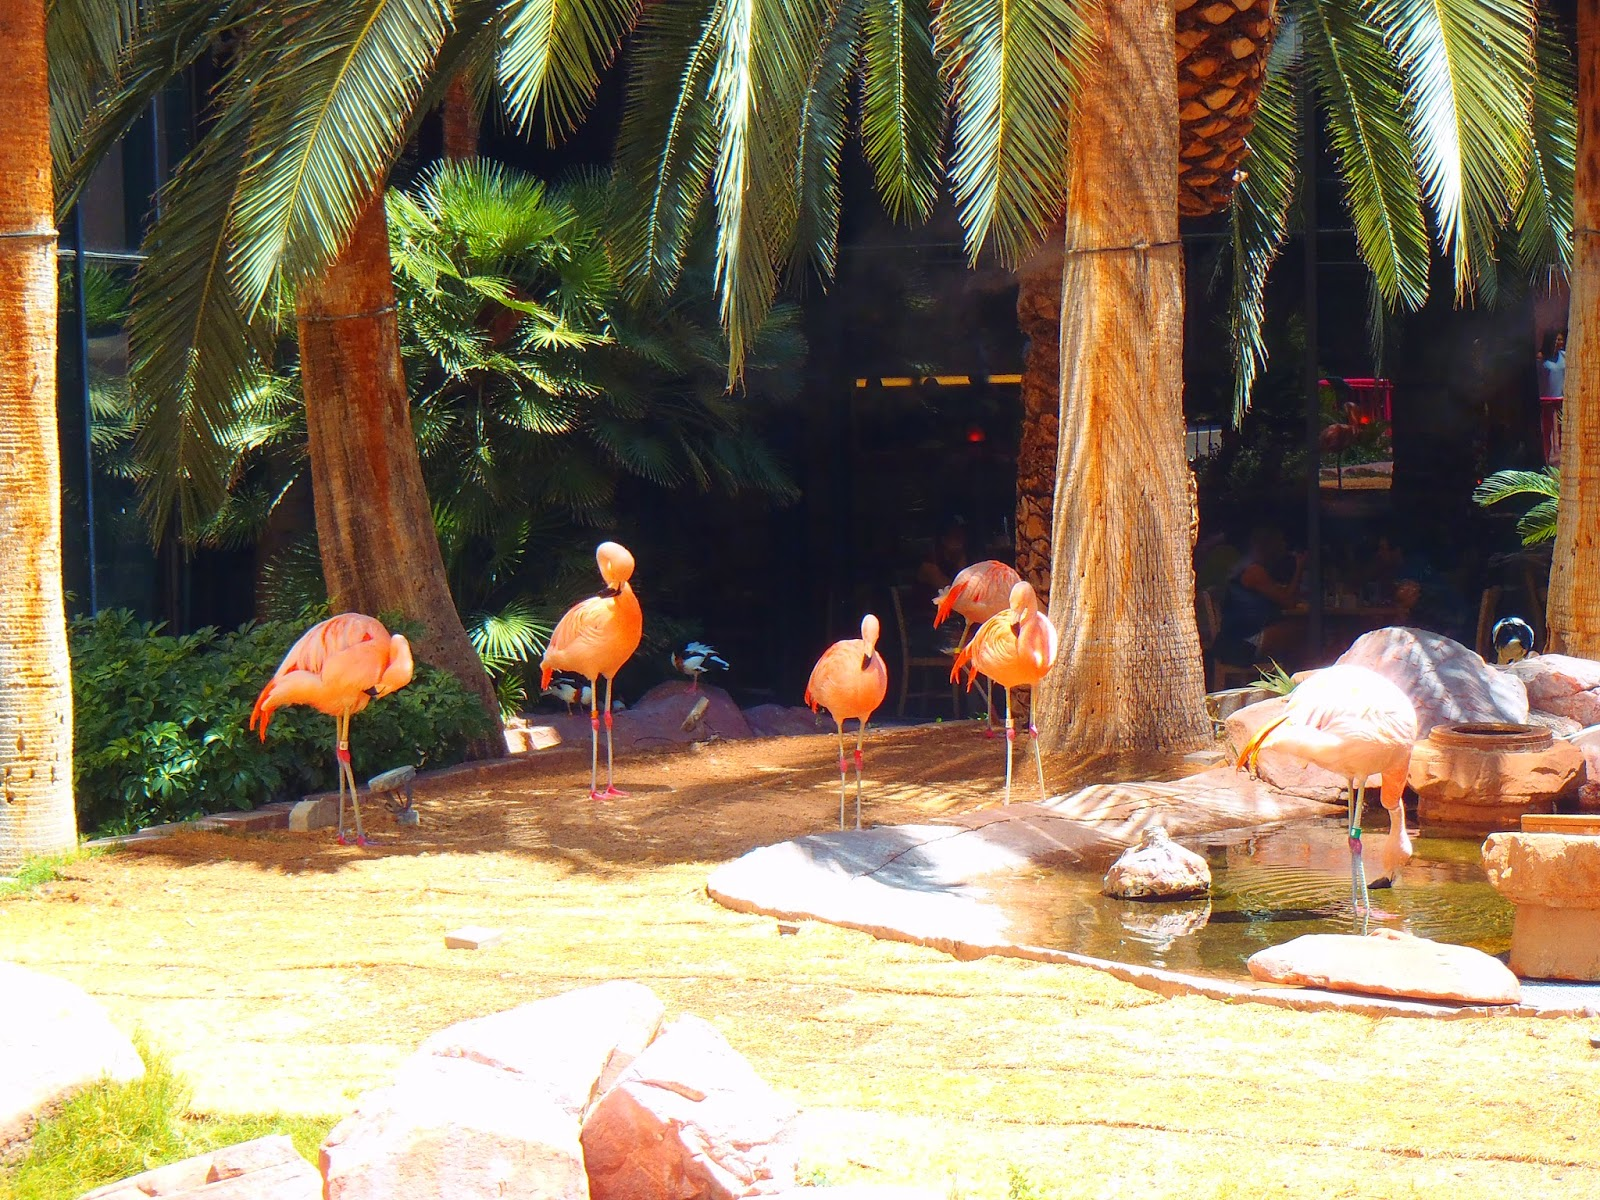 Flamingos Las Vegas